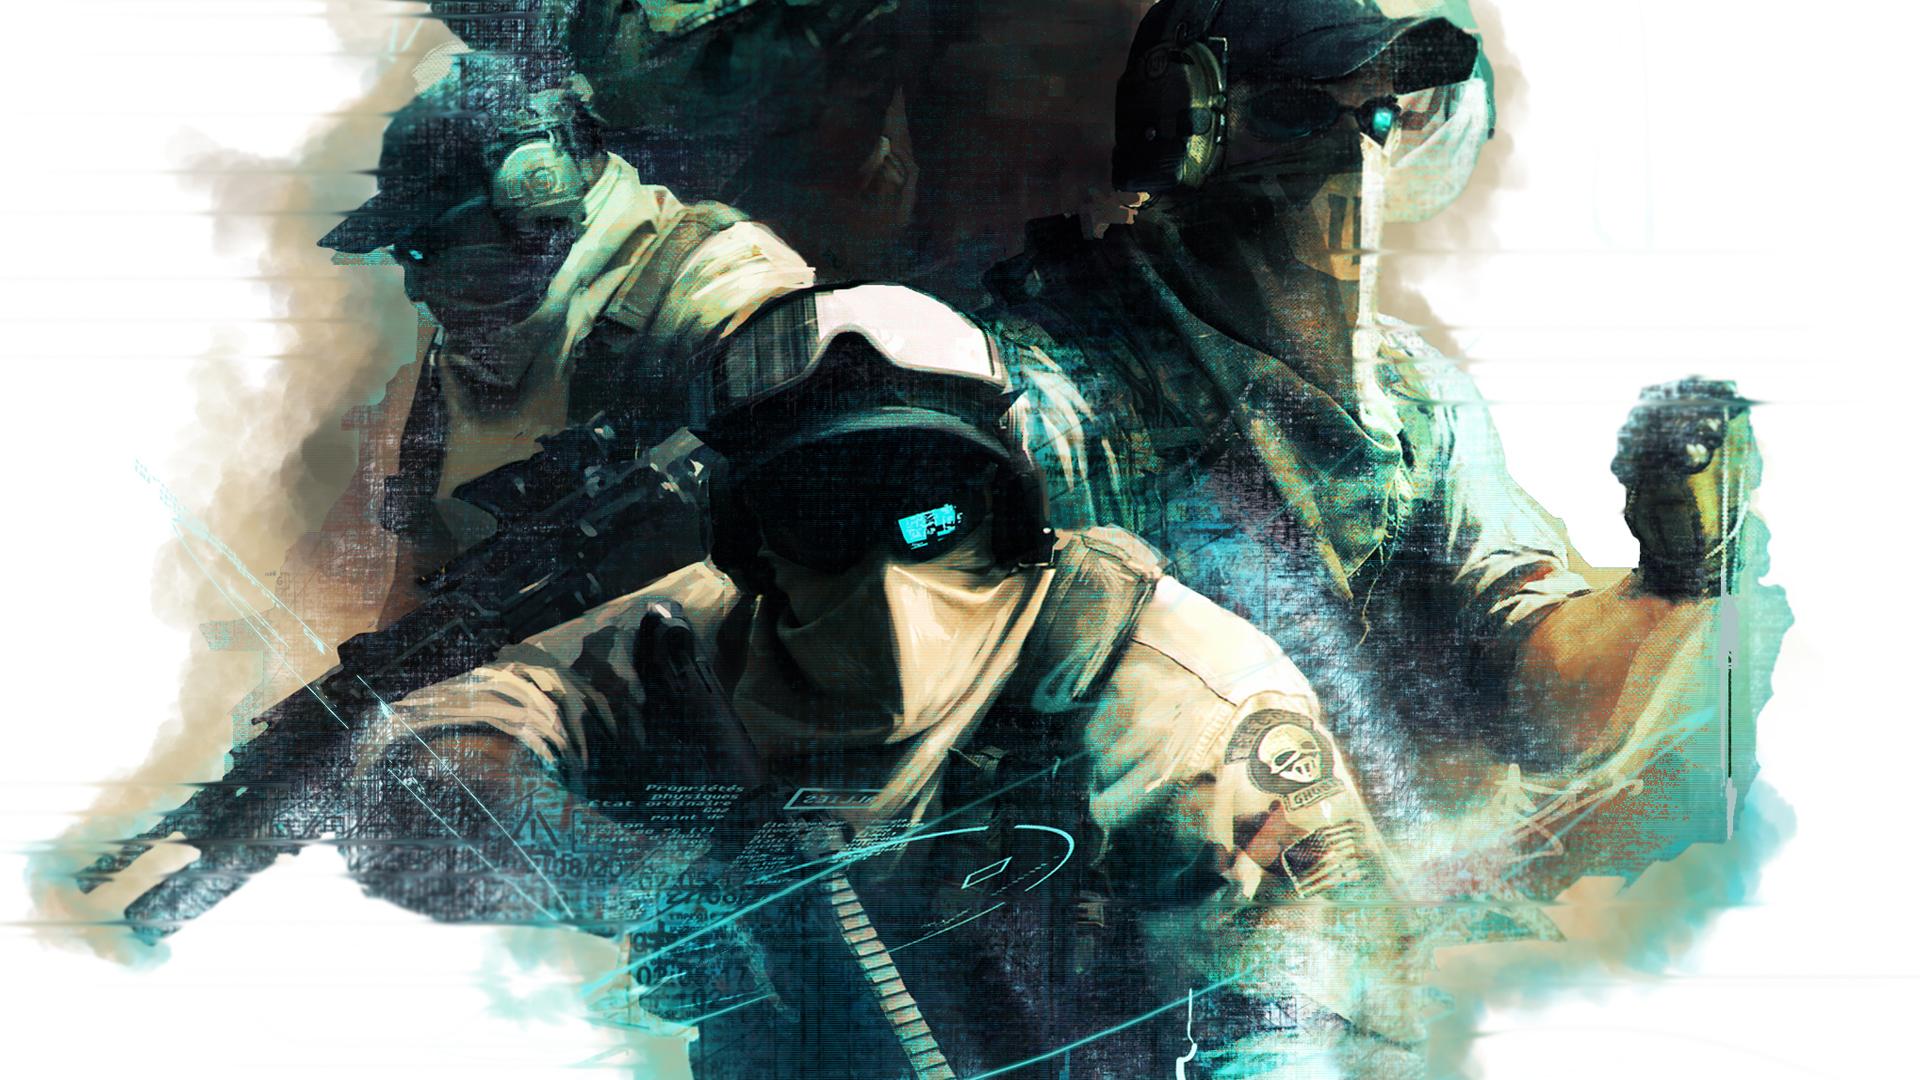 Ghost Recon: Future Soldier Computer Wallpapers, Desktop ...